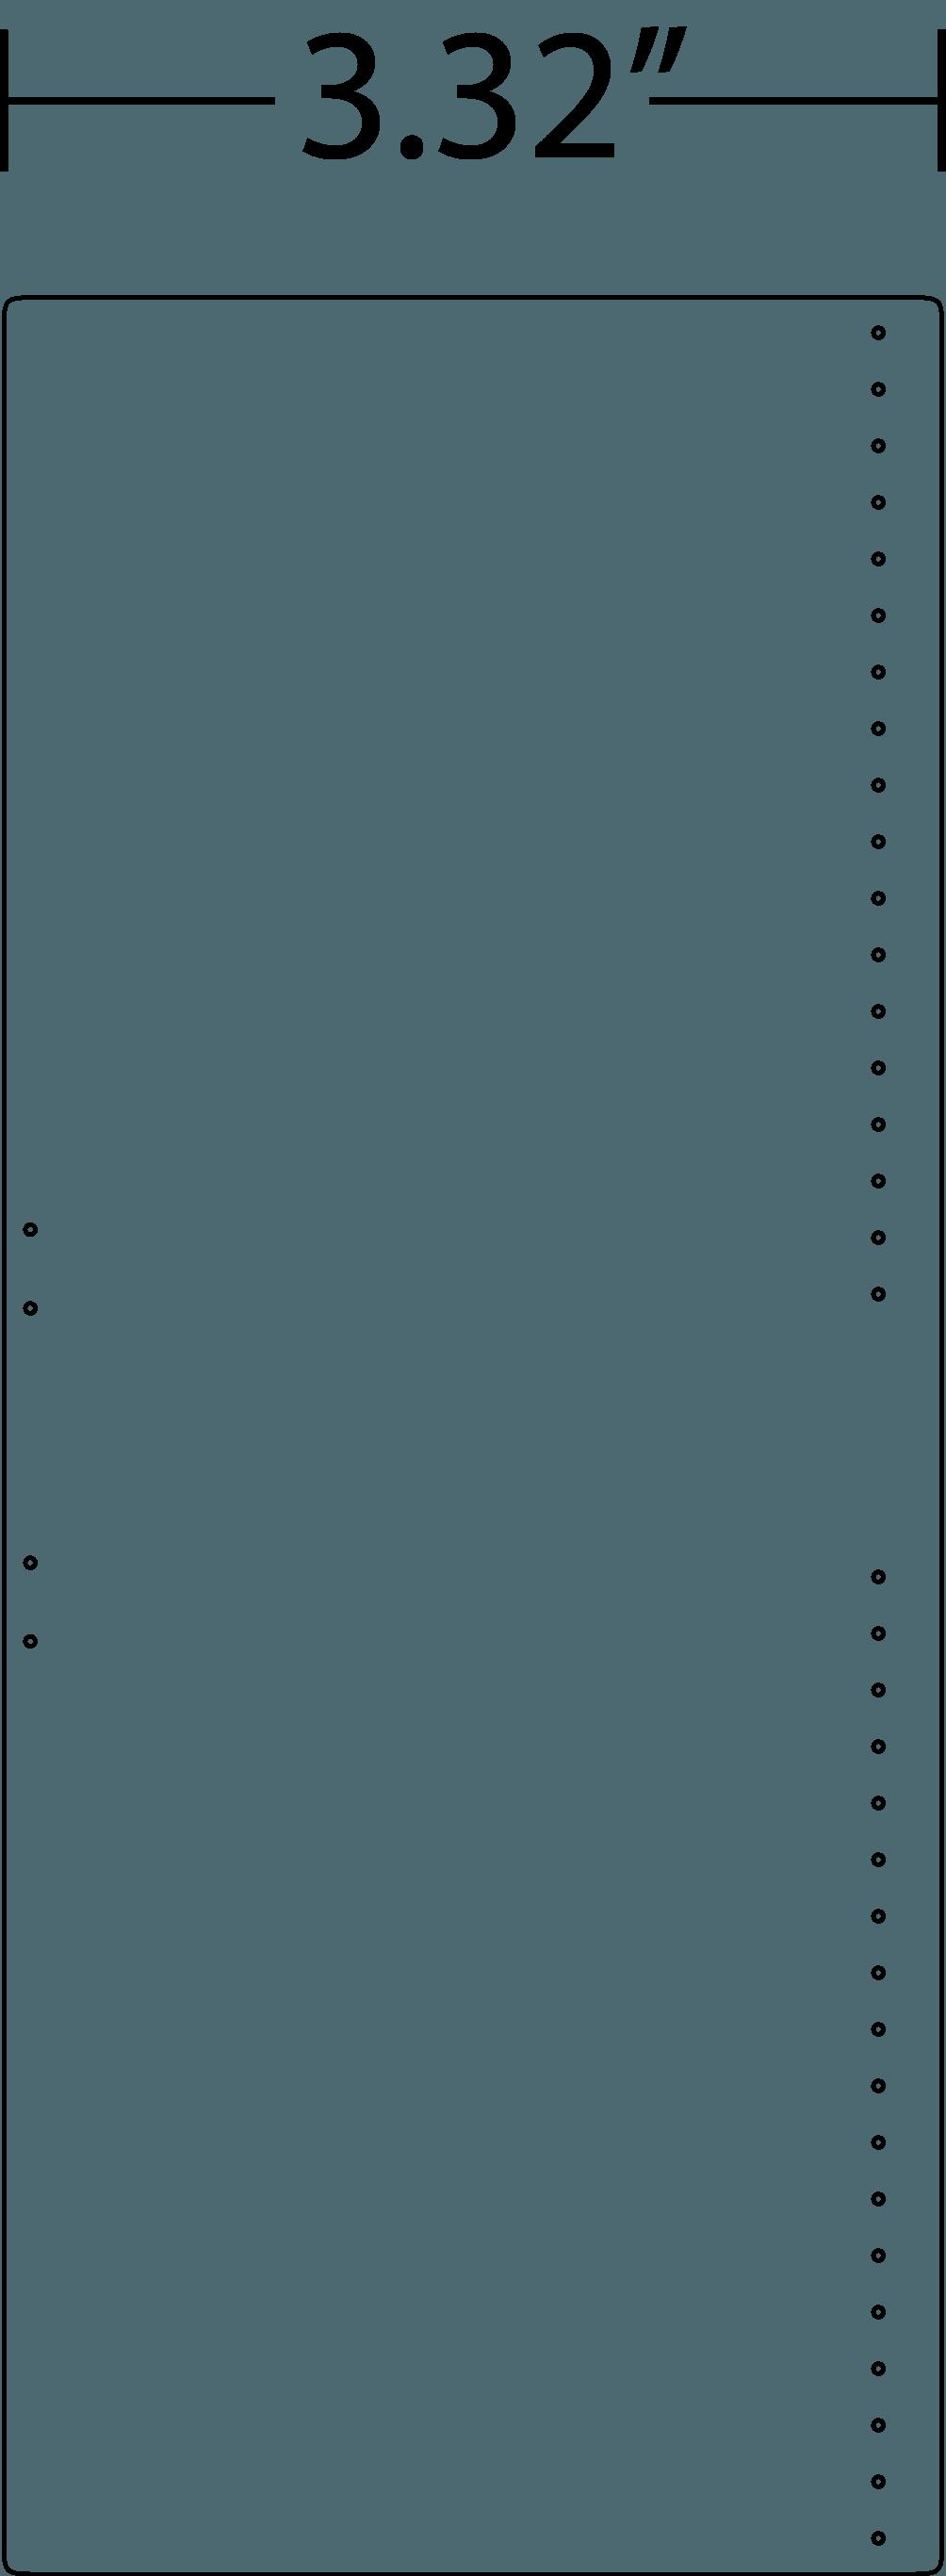 Blueprint image of frontside of wallet.